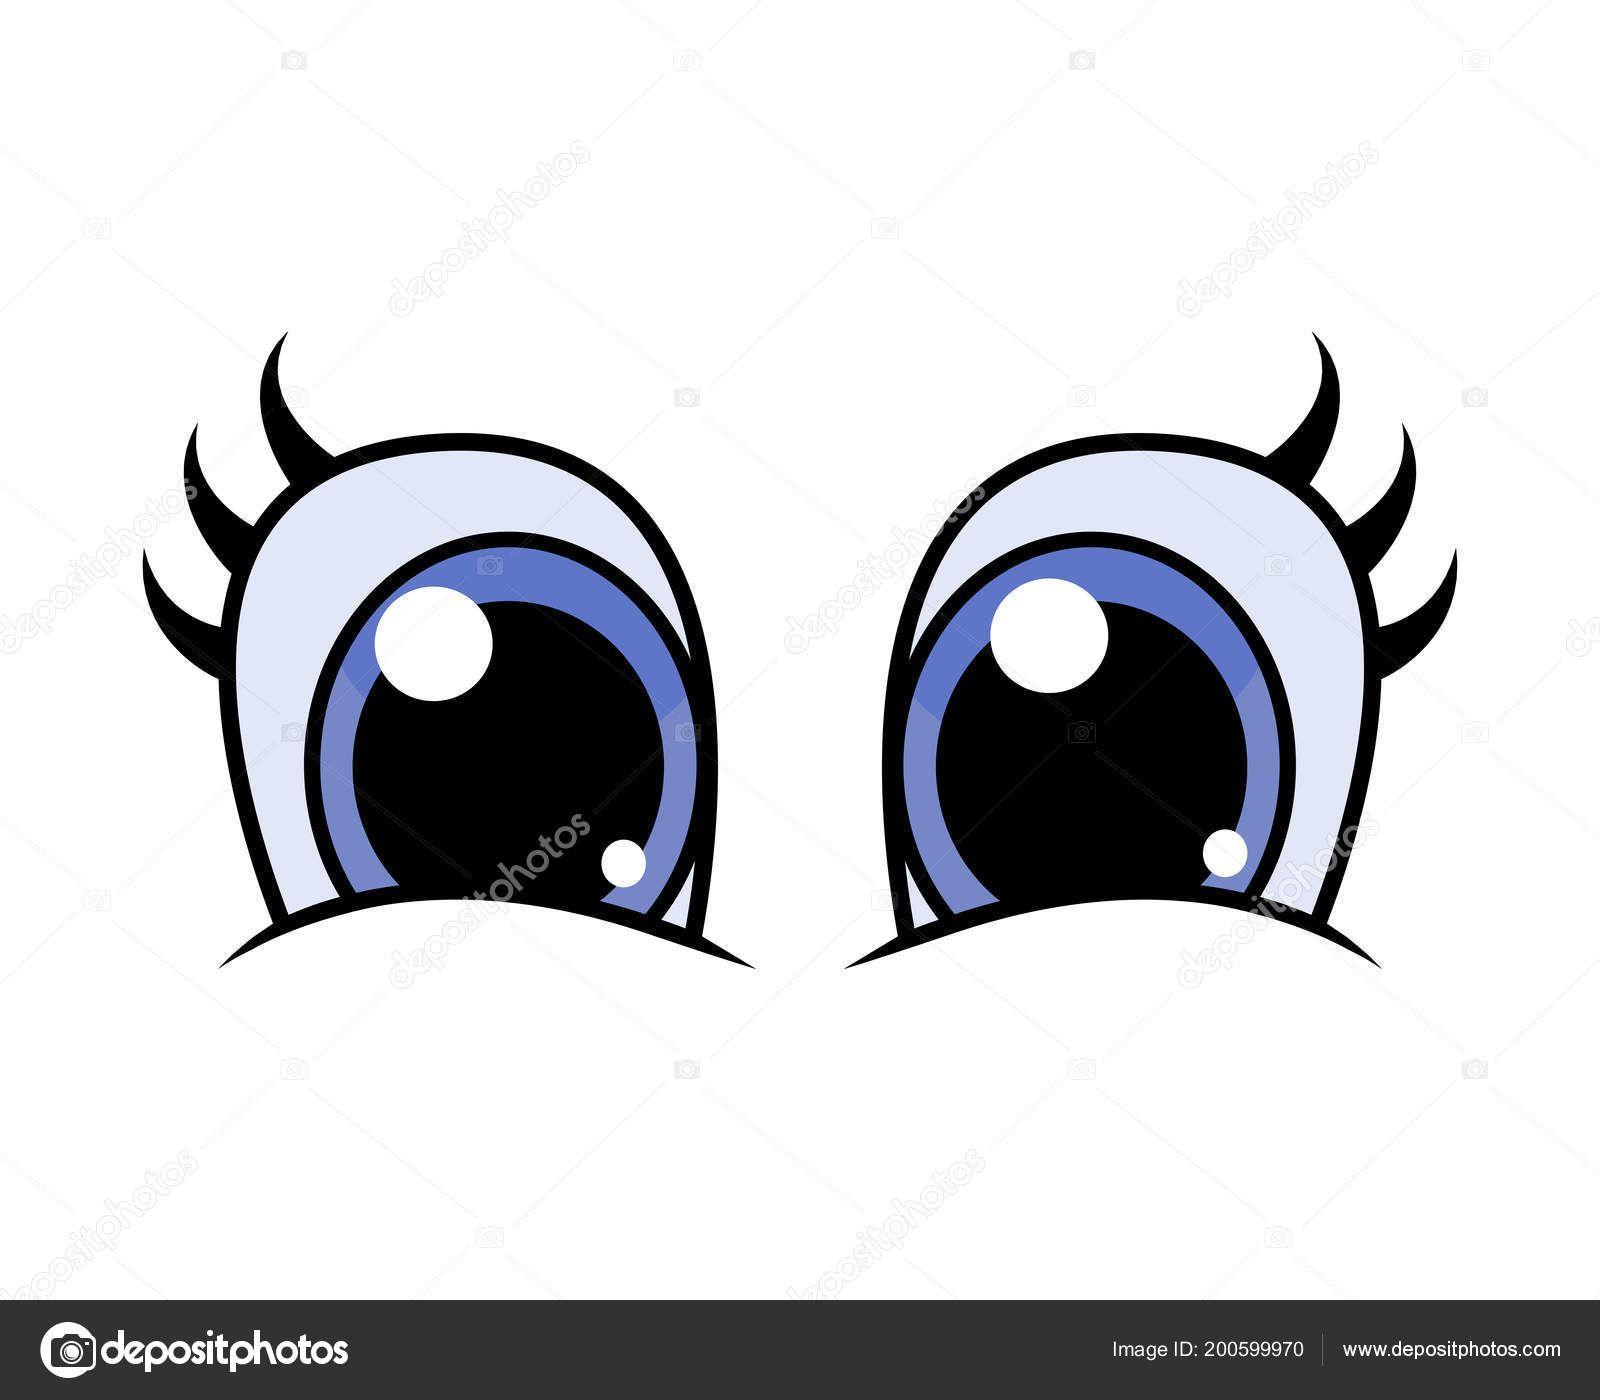 Ojos Personaje Dibujos Animados Con Pestanas Vector Diseno Aislado Blanco Ilustracion De Stock Dibujos Pintado De Ojos Ojos De Muneca